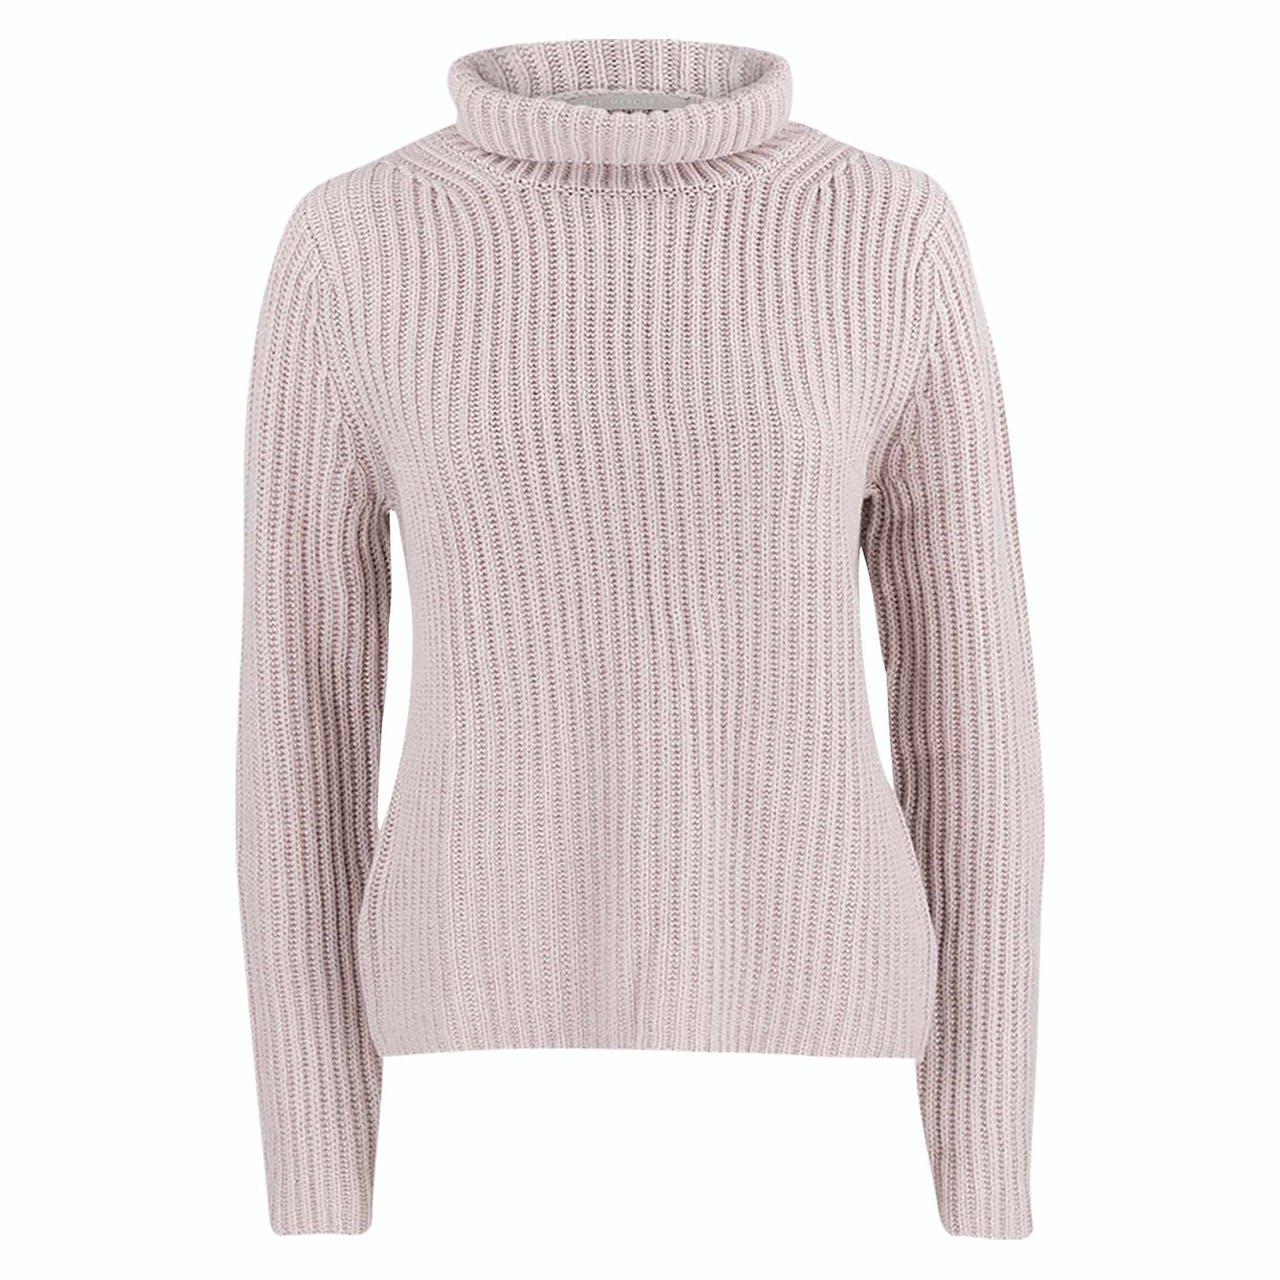 Pullover - Loose Fit - Kaschmir